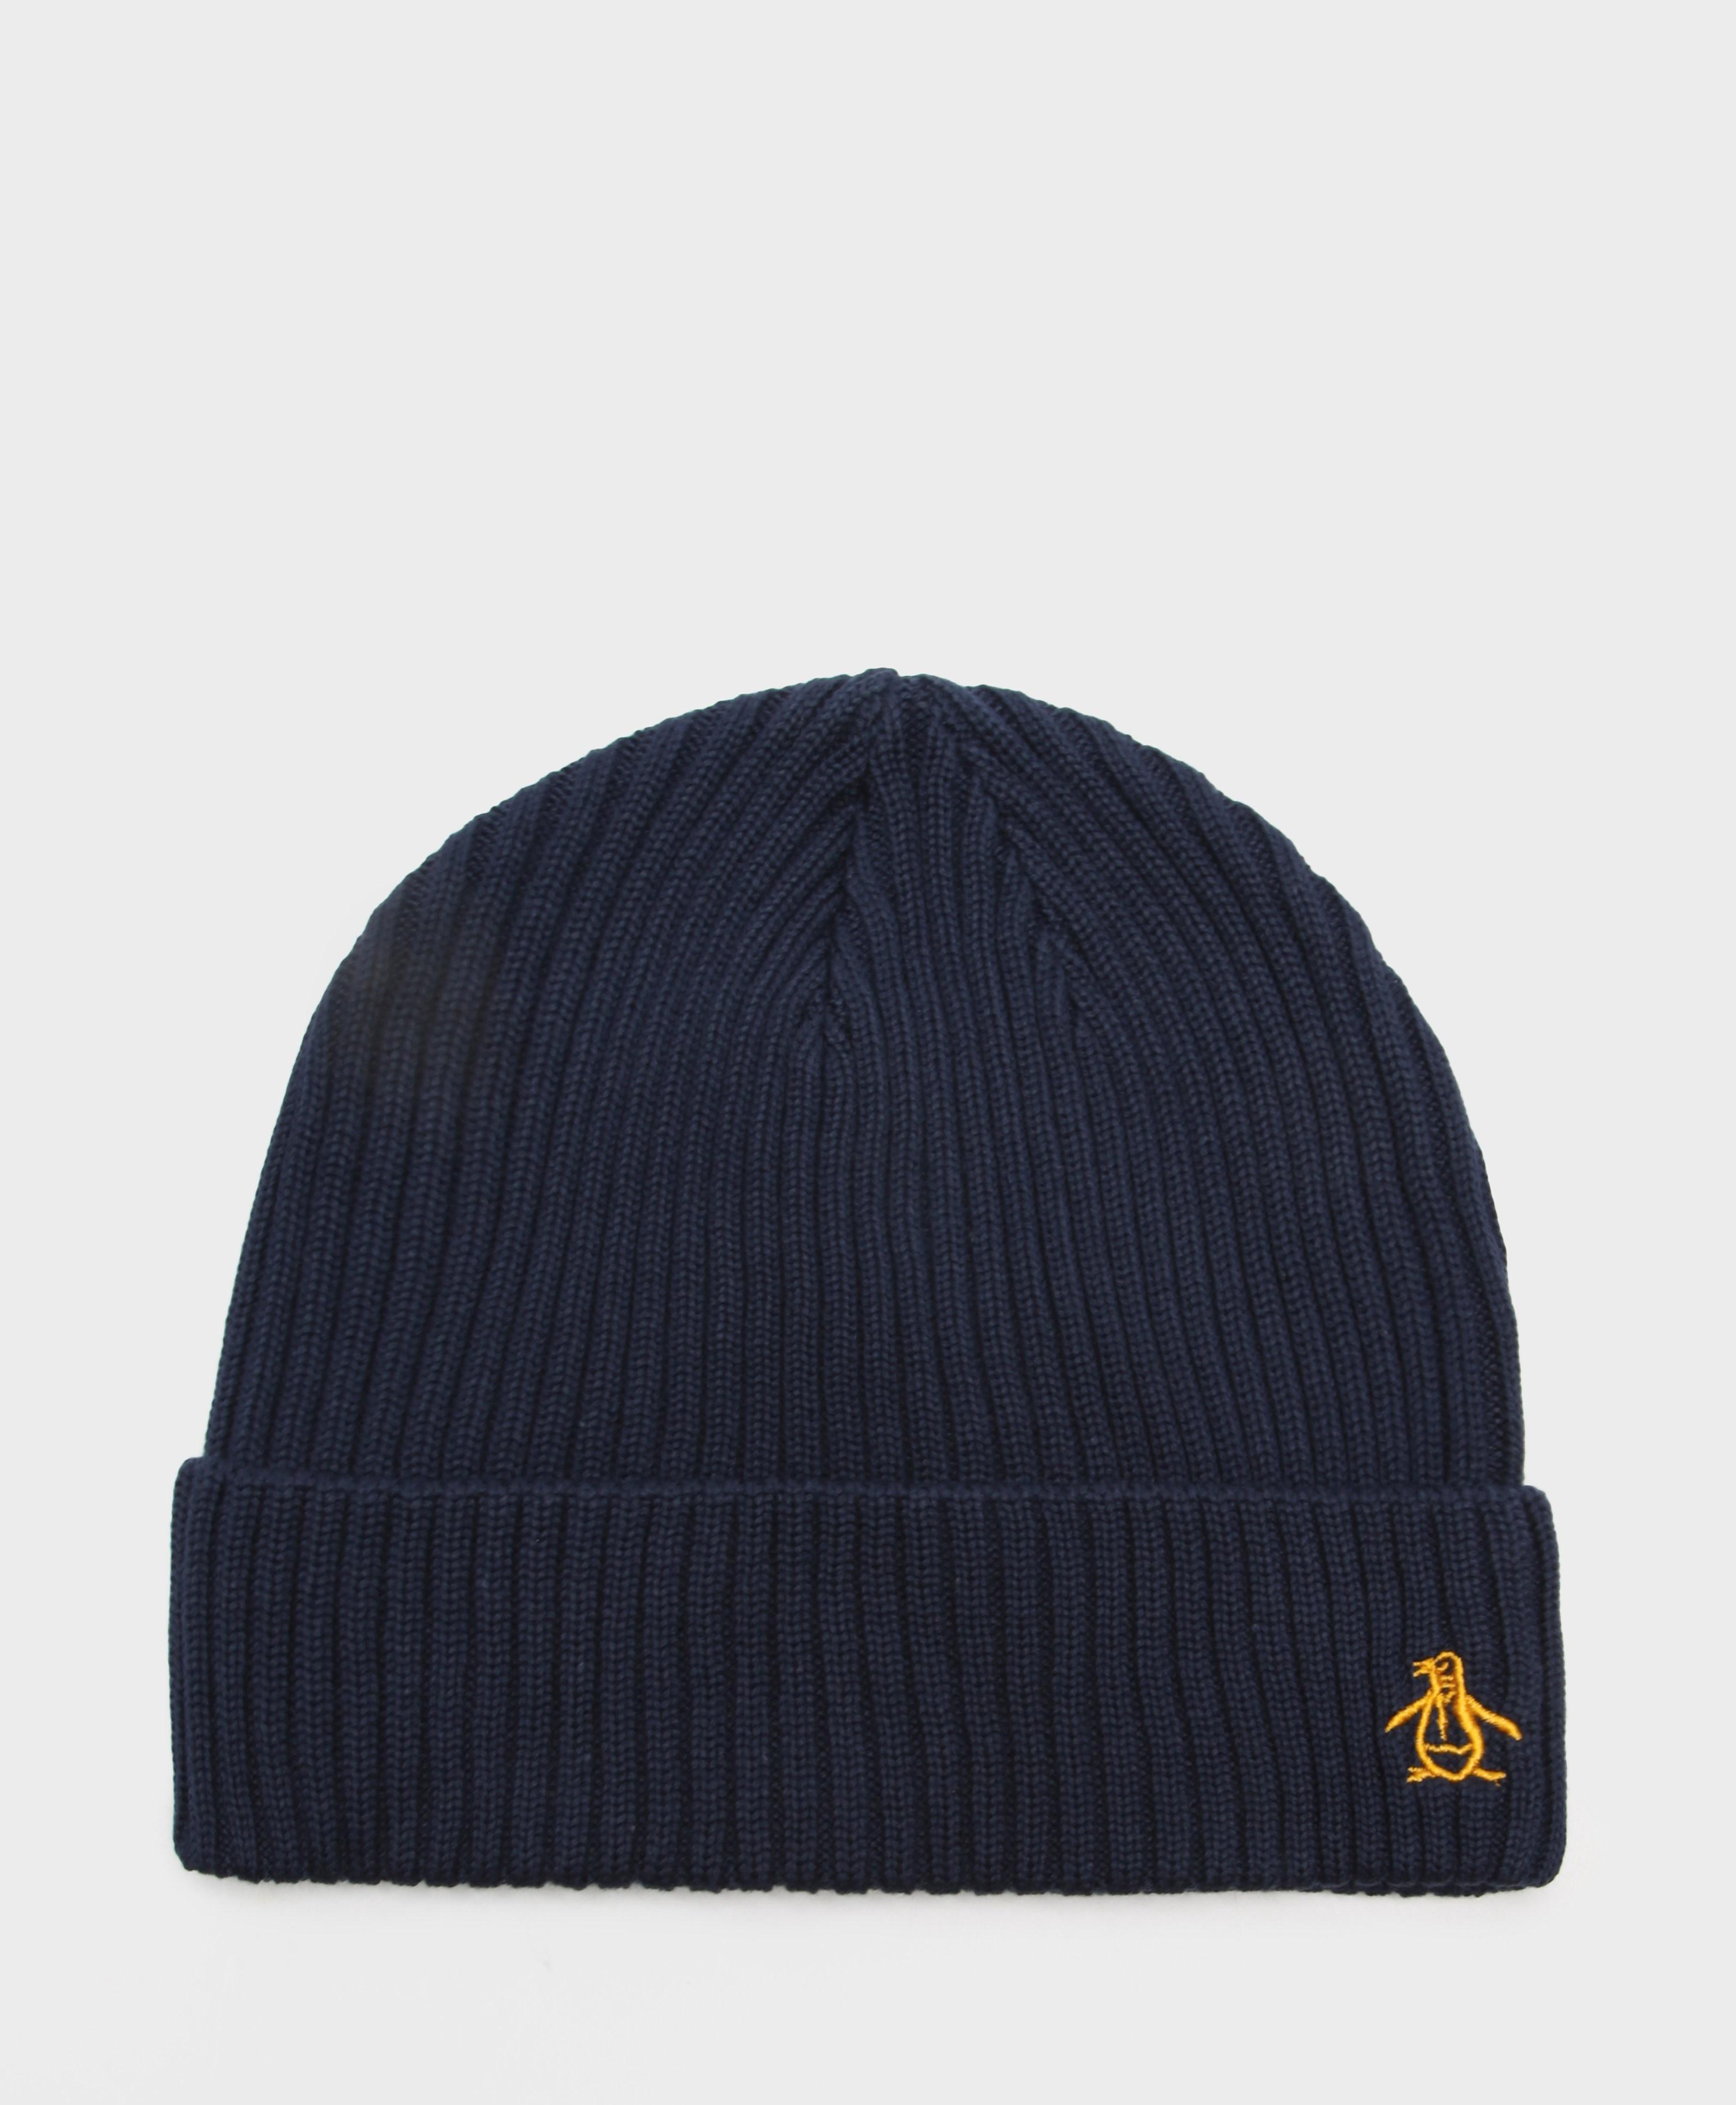 Original Penguin Rib Turn Hat